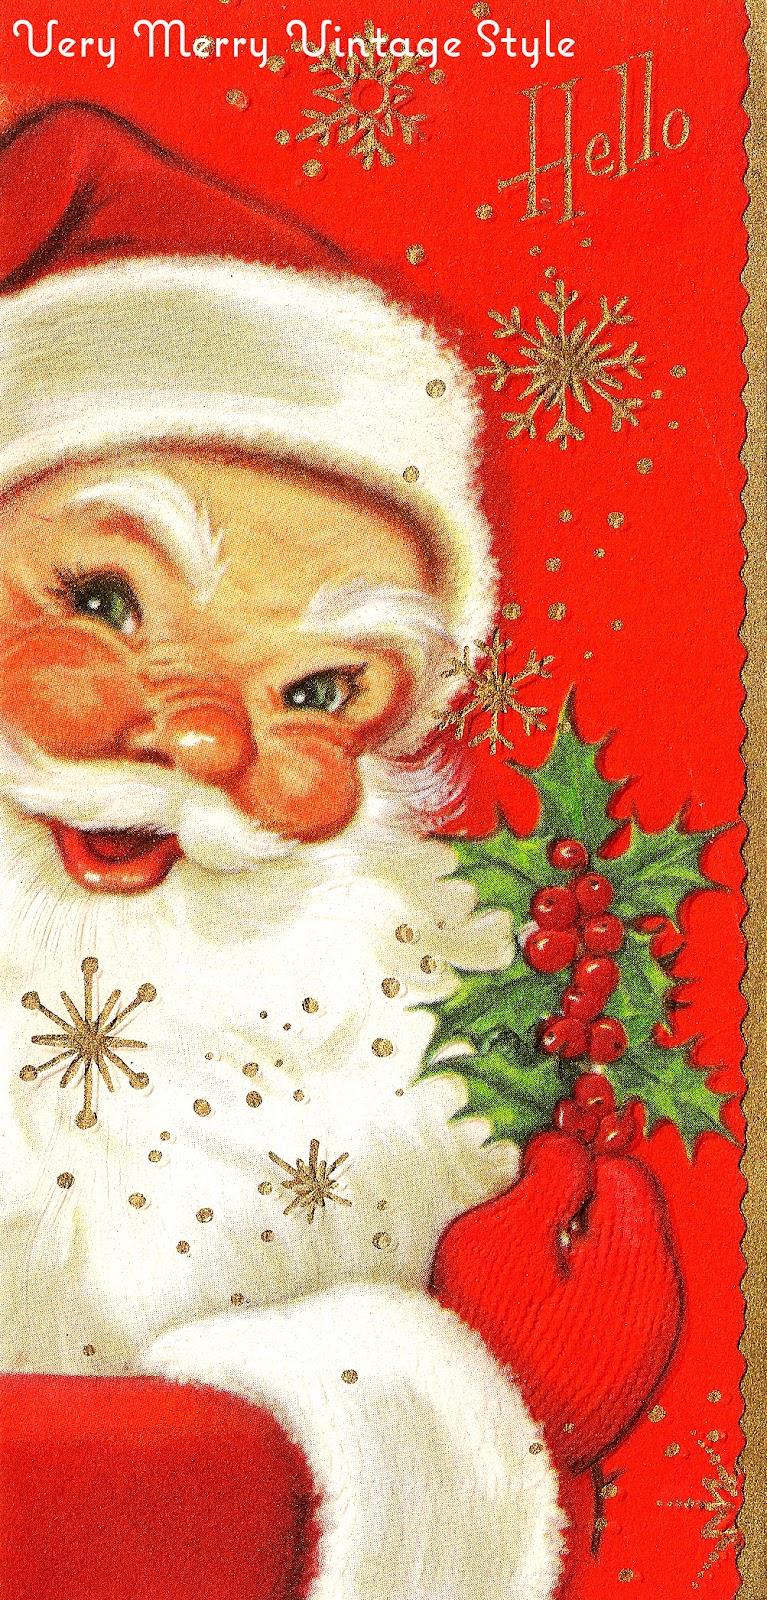 very merry vintage syle hey santa vintage christmas card. Black Bedroom Furniture Sets. Home Design Ideas